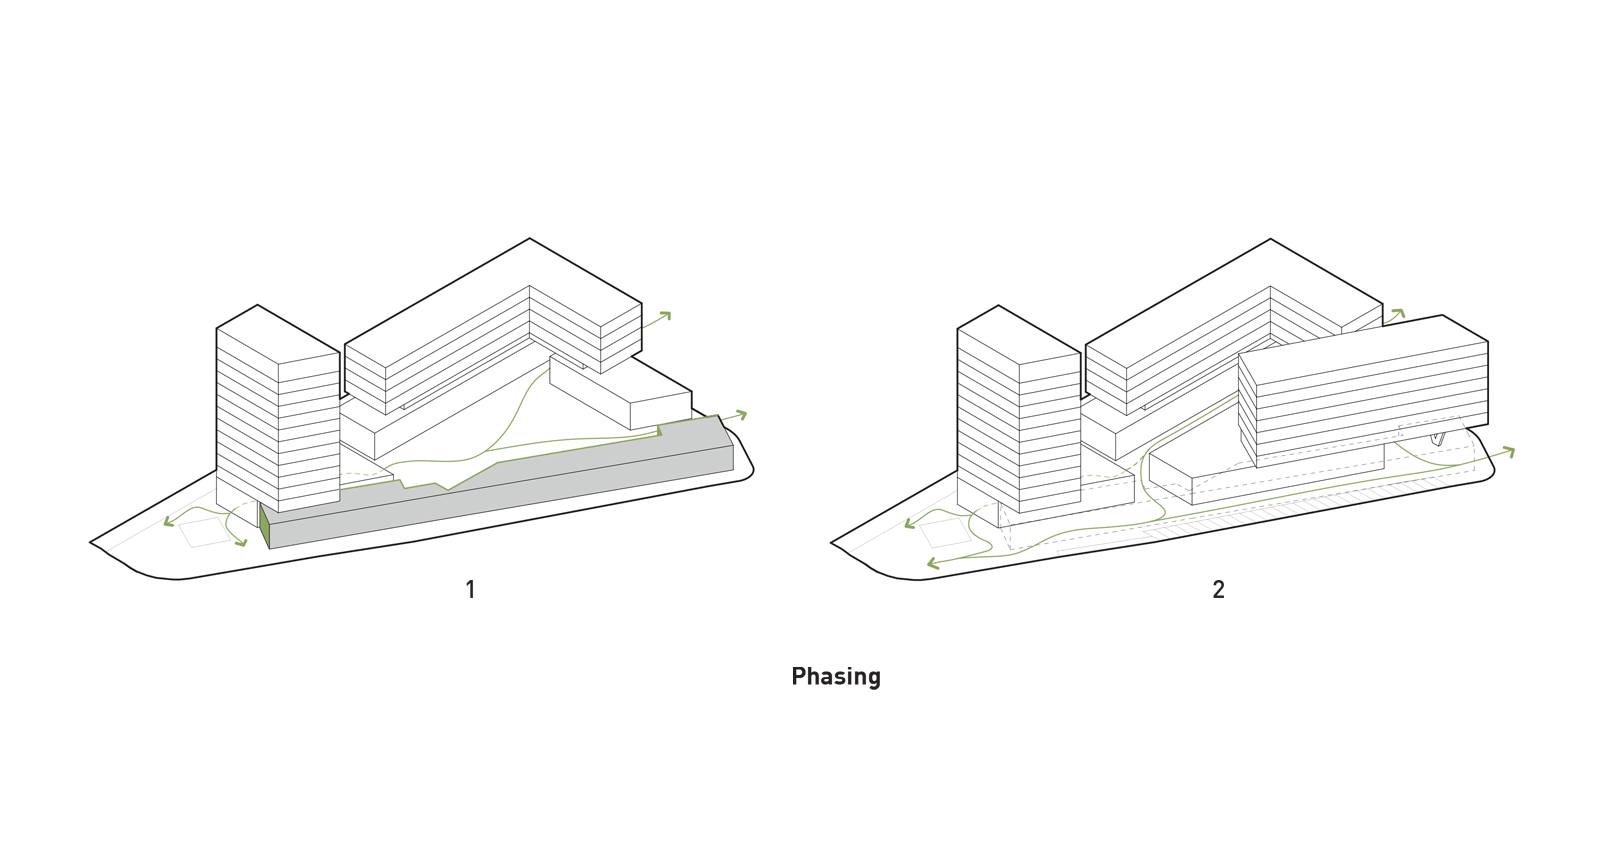 europan-14-fablinz-post-process-phasing